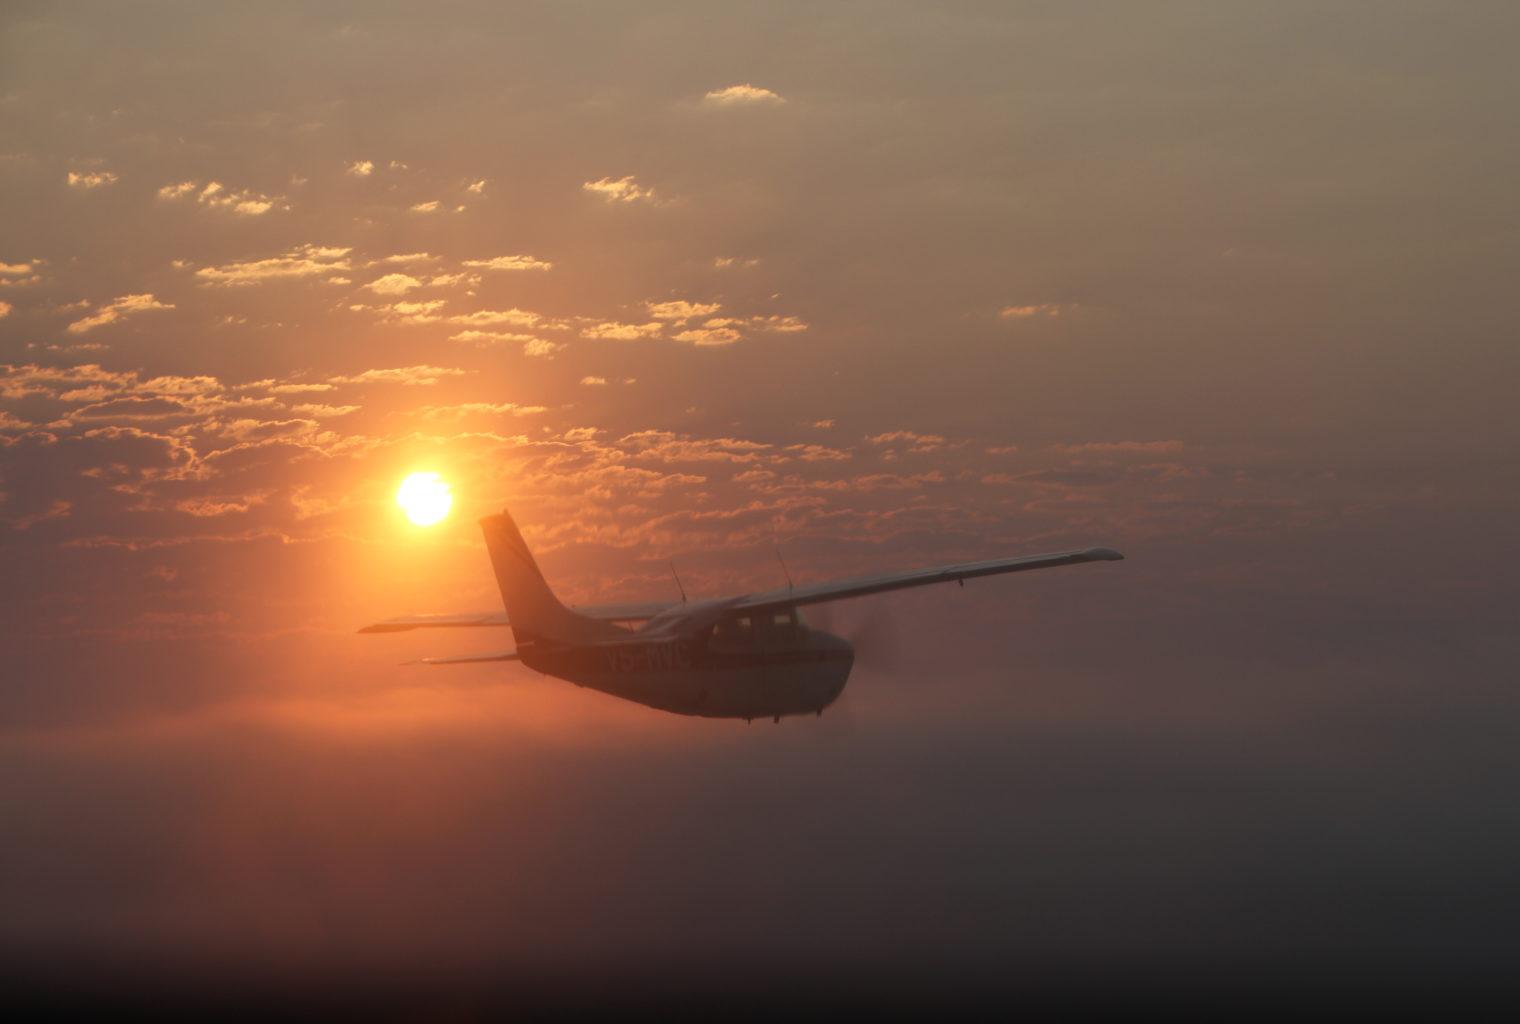 Leylandsdrift Camp Namibia Plane